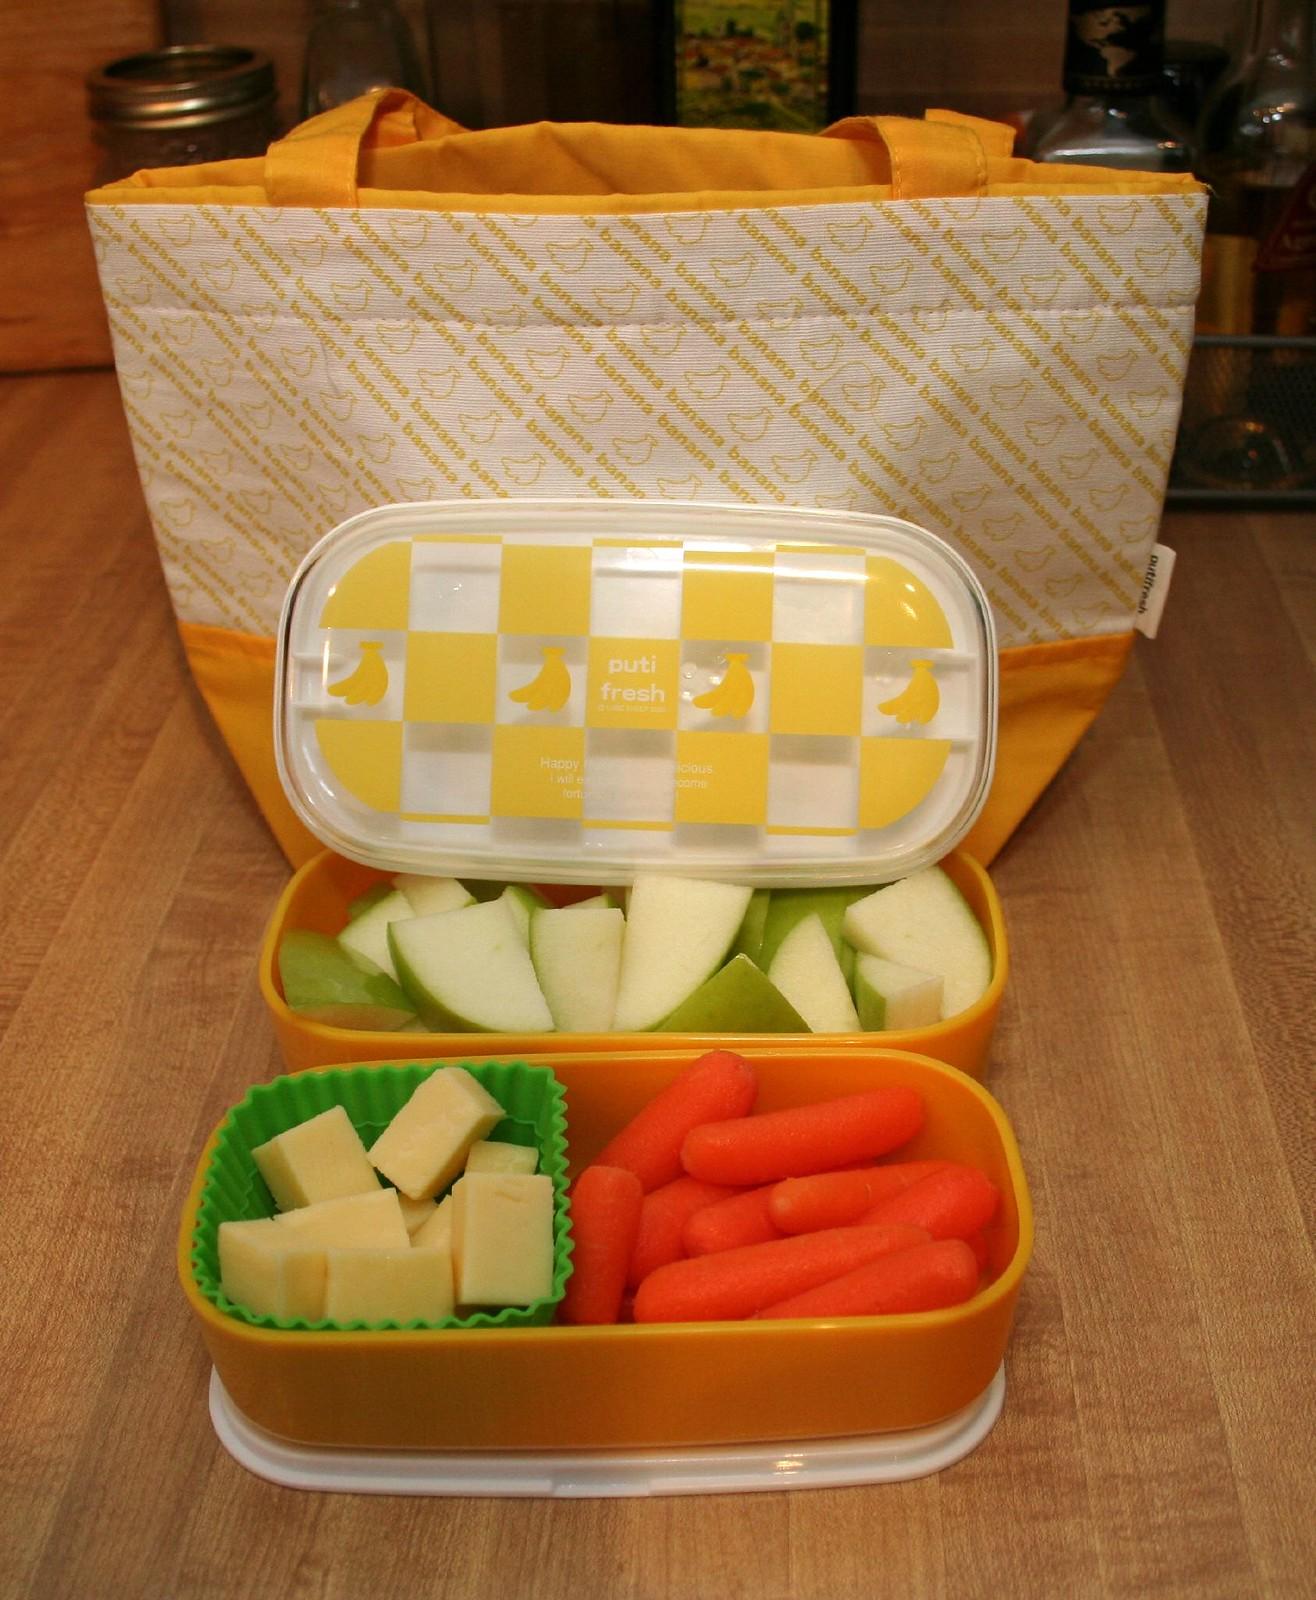 tupperware rempli de fruits et légumes